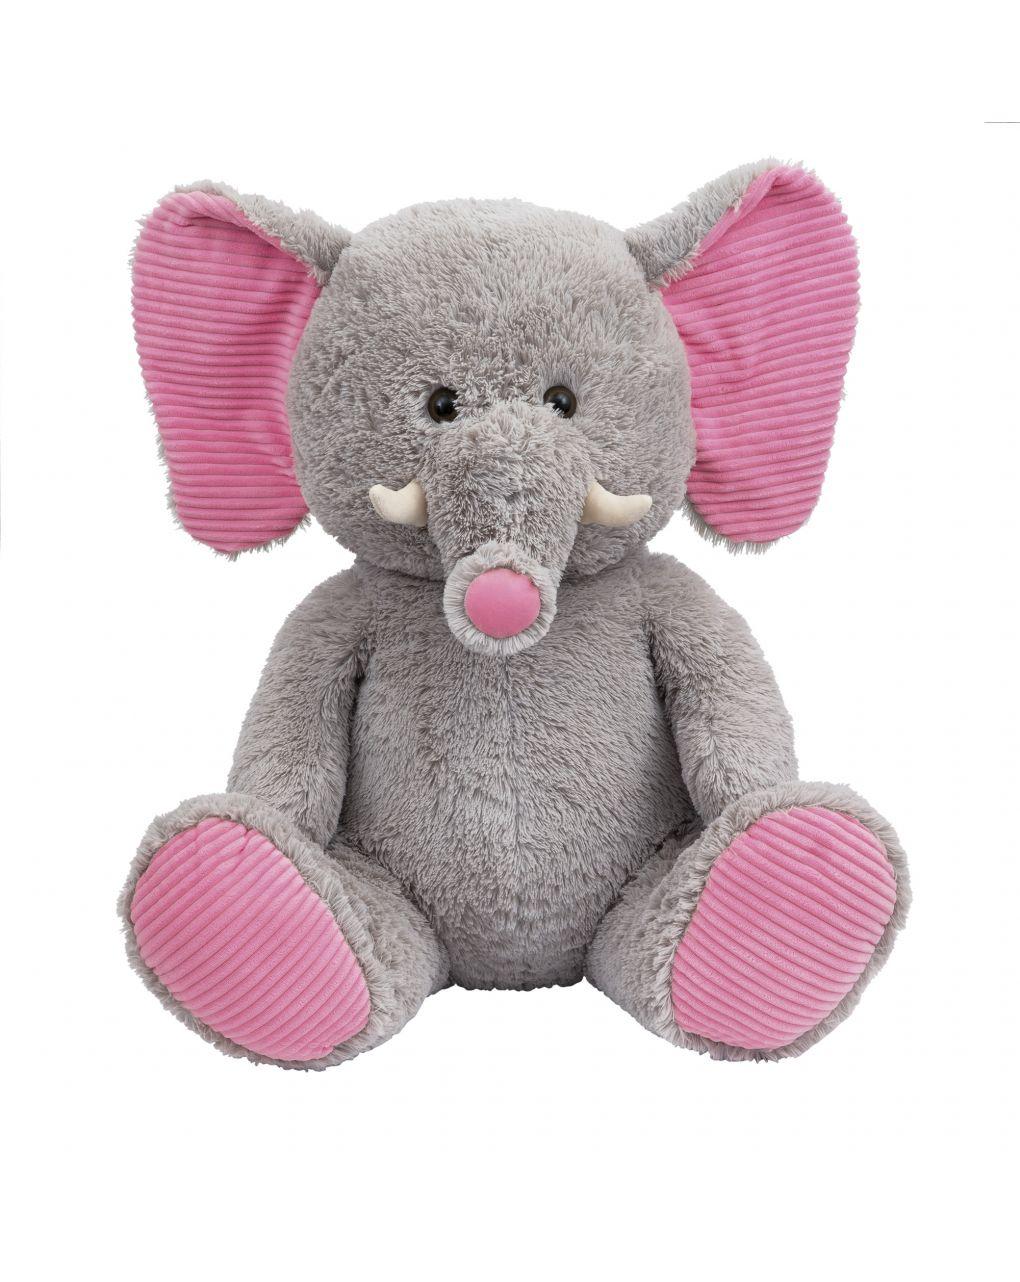 Amiplush - peluche cane e elefante - Ami Plush